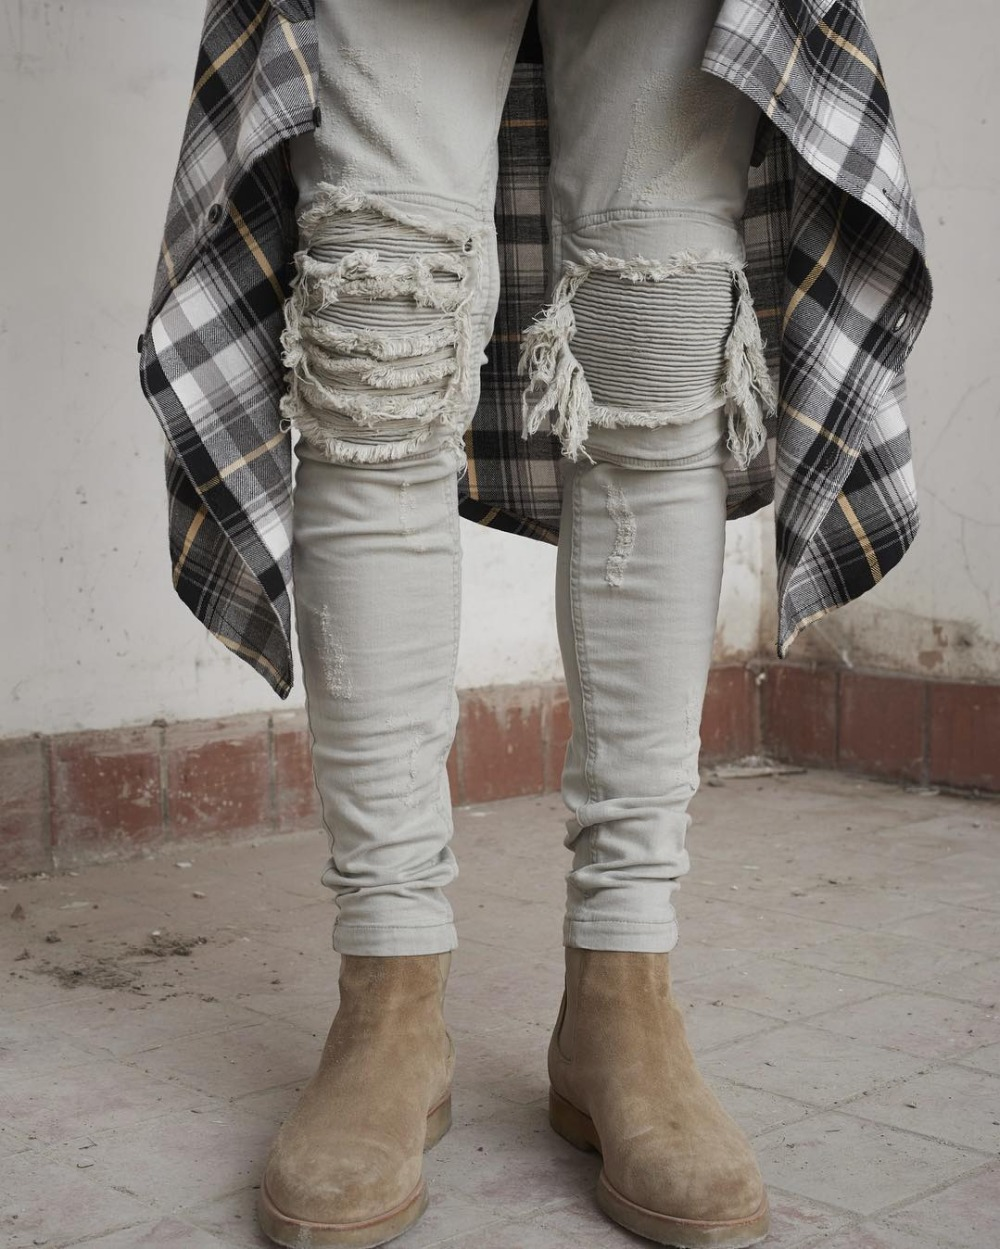 Reichstadt Jungen Kinderhose Jogging Jeans Destroyed Effekt Used Look Streetwear